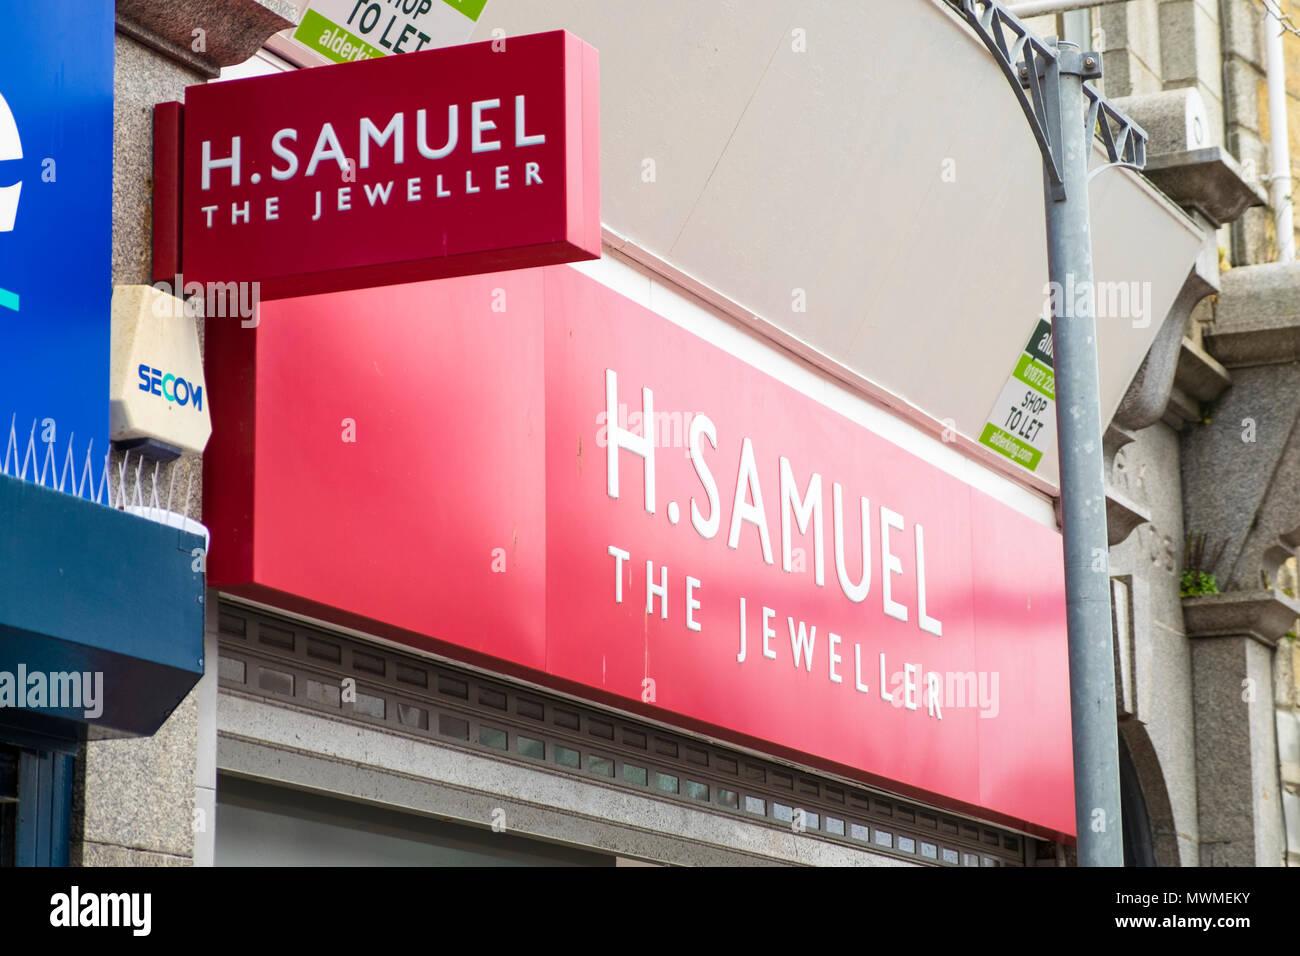 H. samuel, the jeweller, newquay, uk - Stock Image